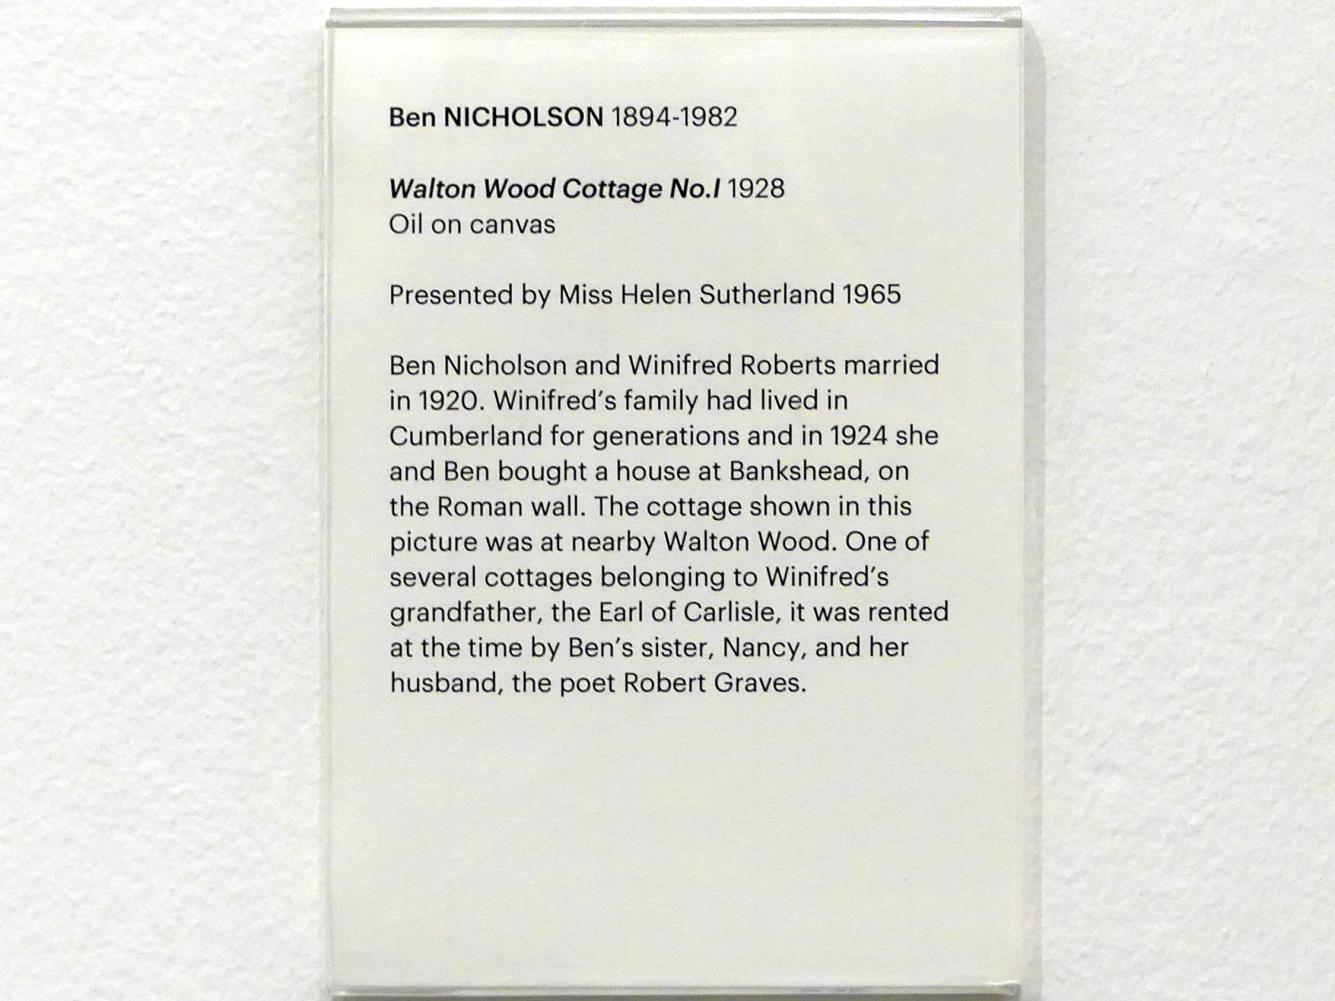 Ben Nicholson: Walton Waldhütte Nr. 1, 1928, Bild 2/2